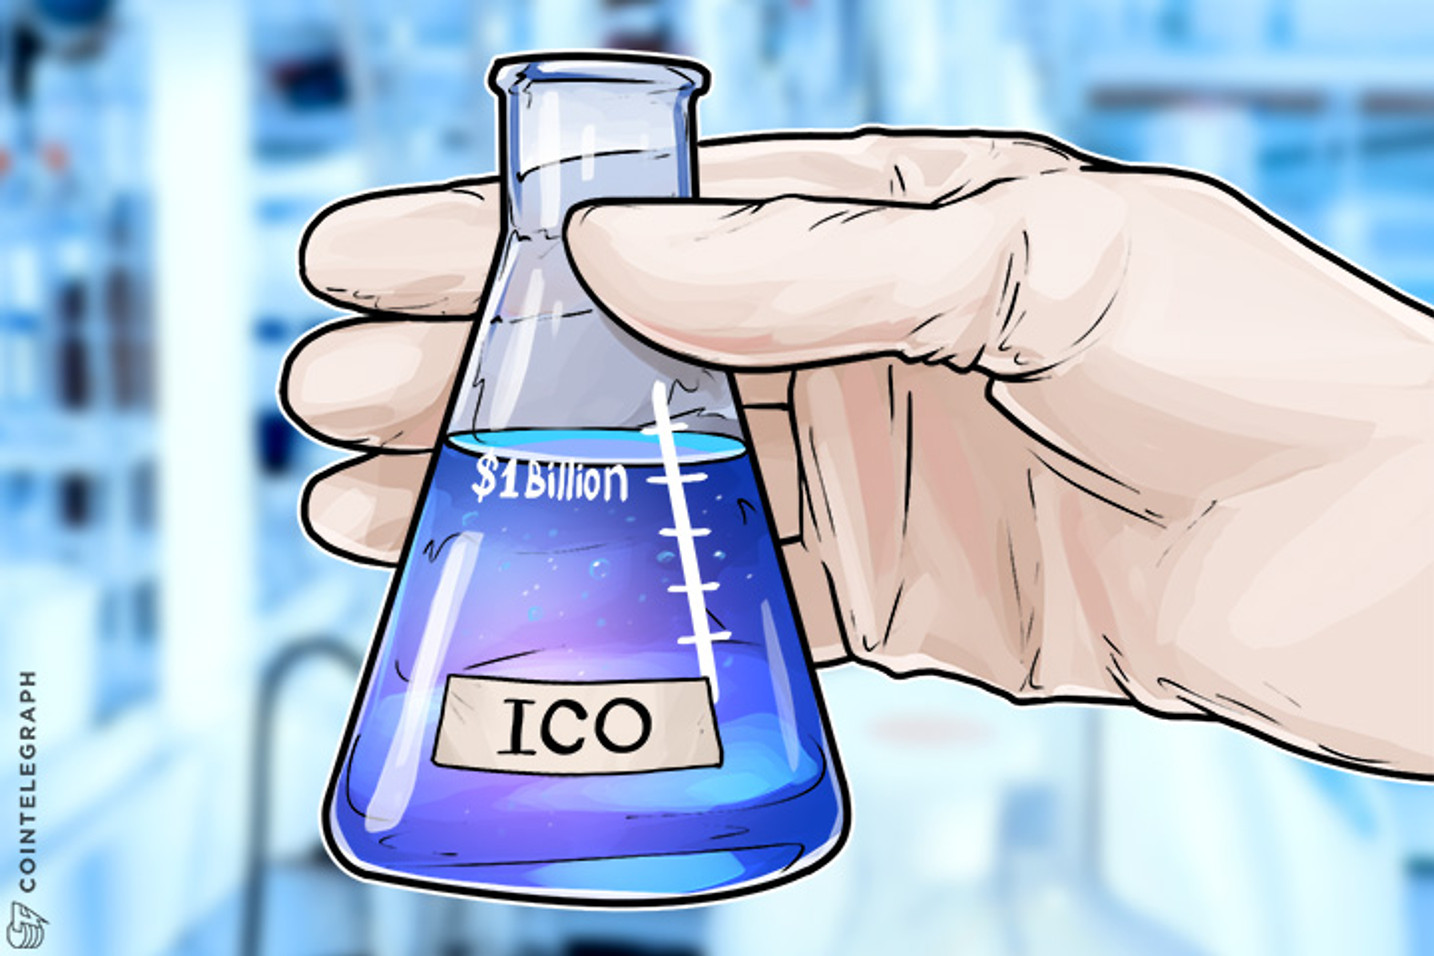 ICO Market Crosses $1 Billion Mark, Is Bubble Imminent?